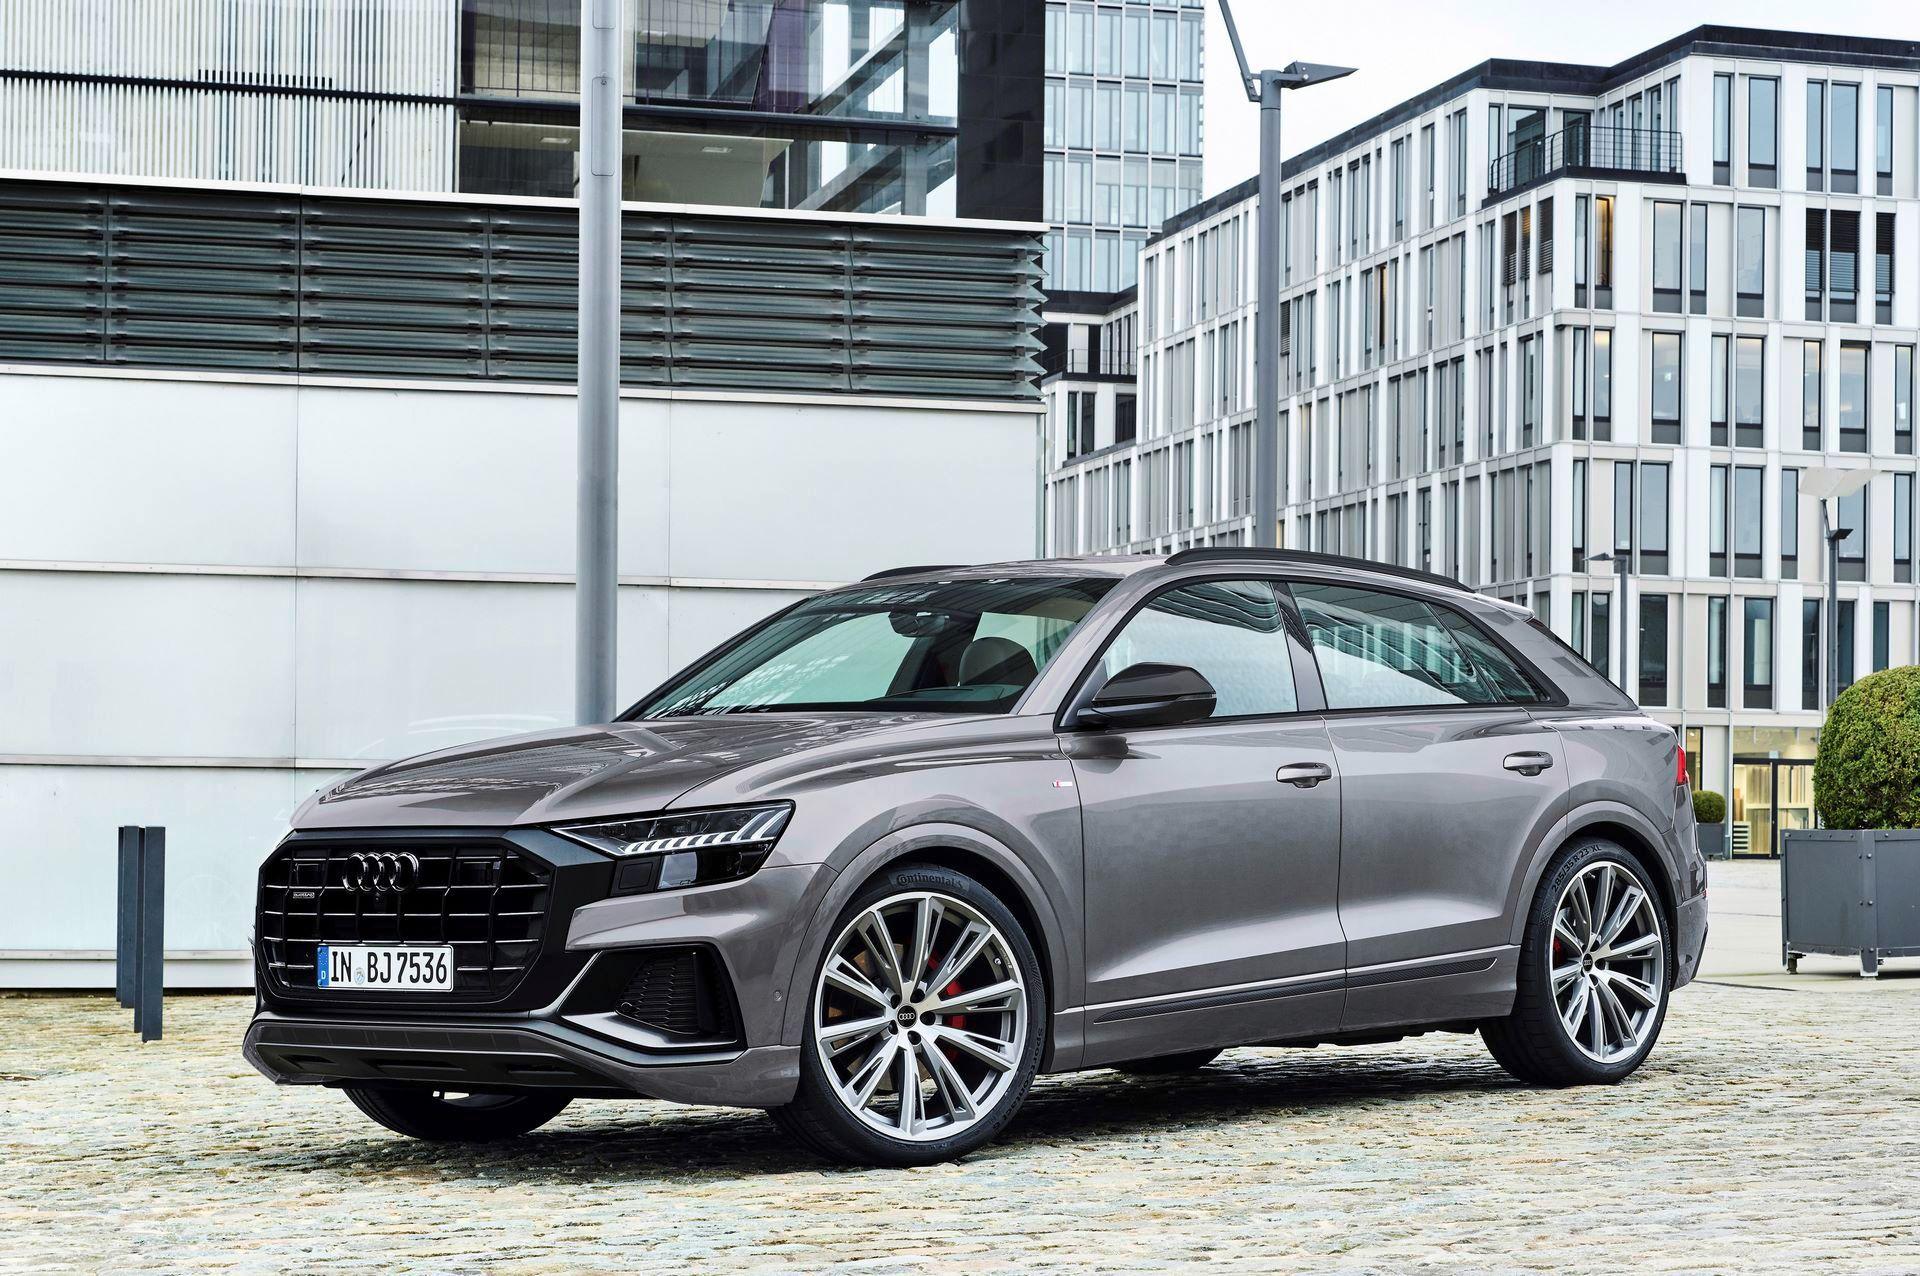 Audi-A4-A5-Q7-Q8-Competition-And-Competition-Plus-Trims-13